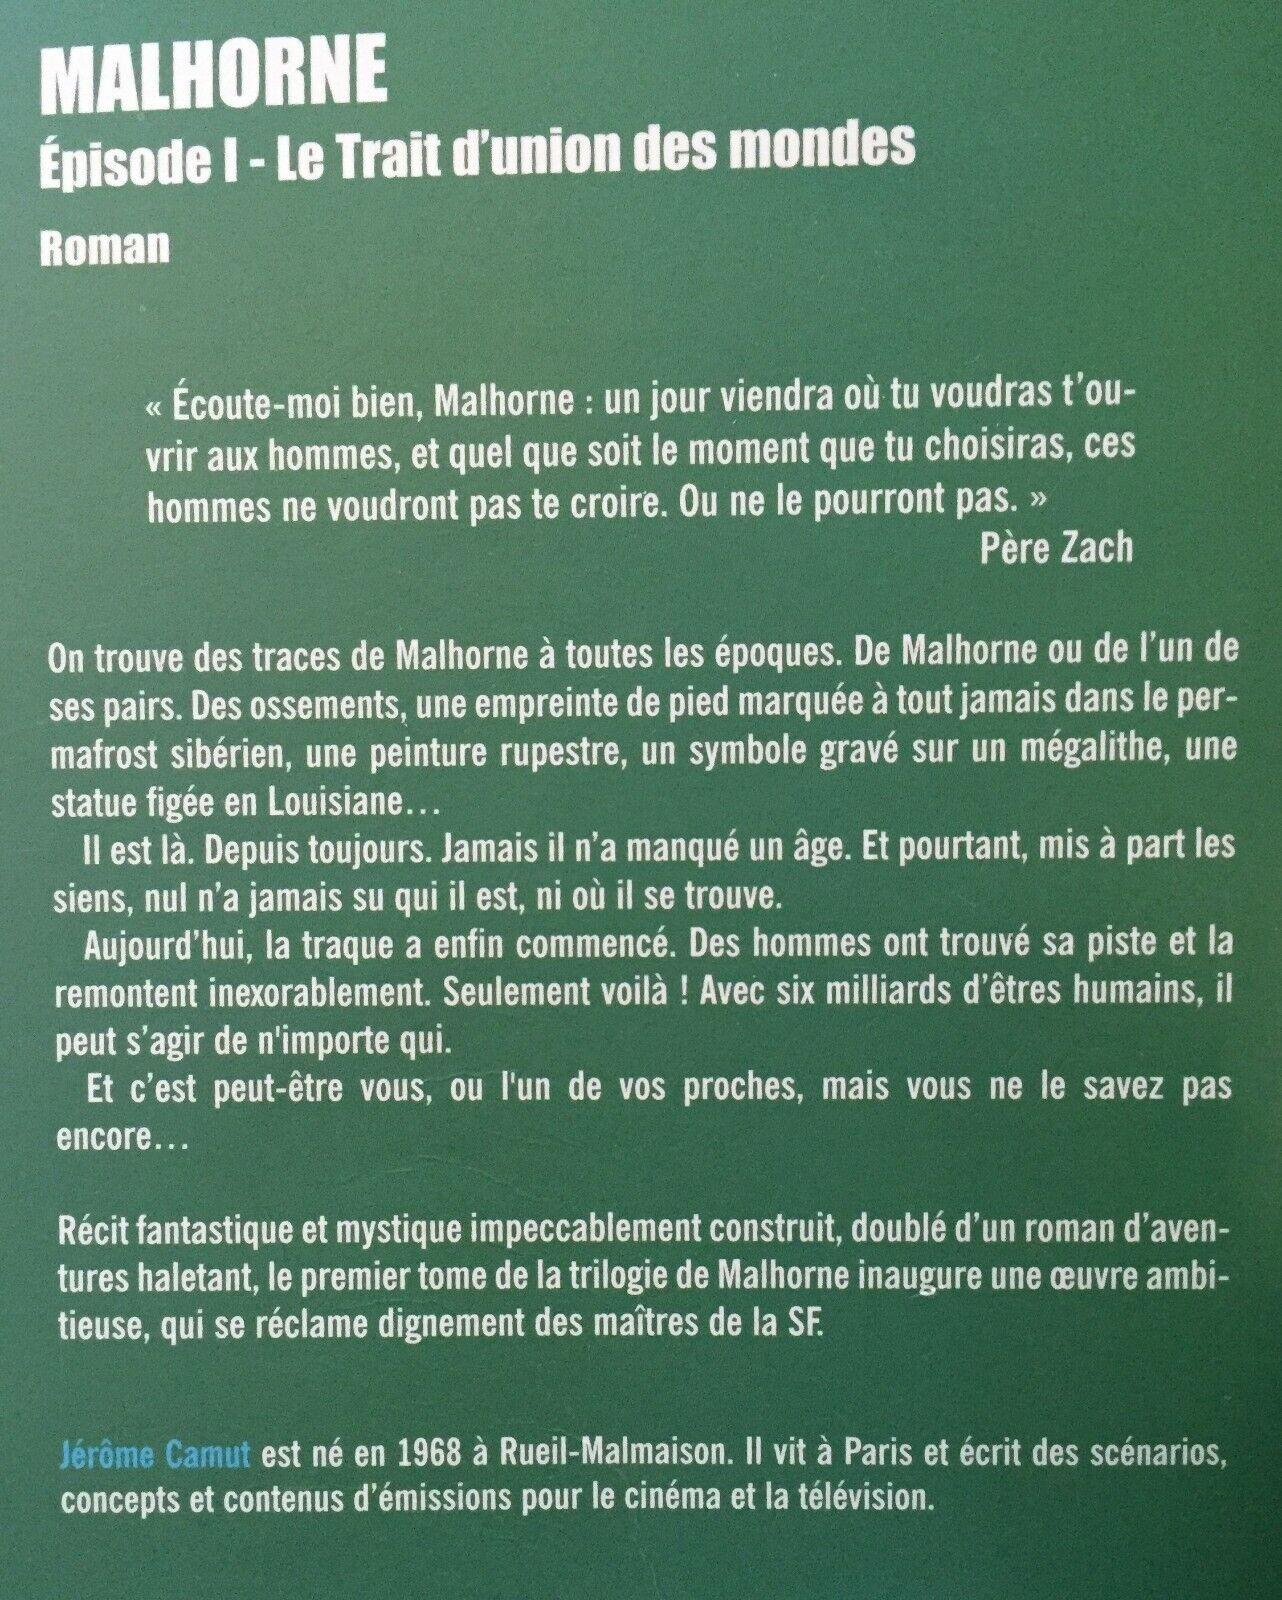 Roman 'malhorne' episode 1/tome 1 de j. camut – etat correct